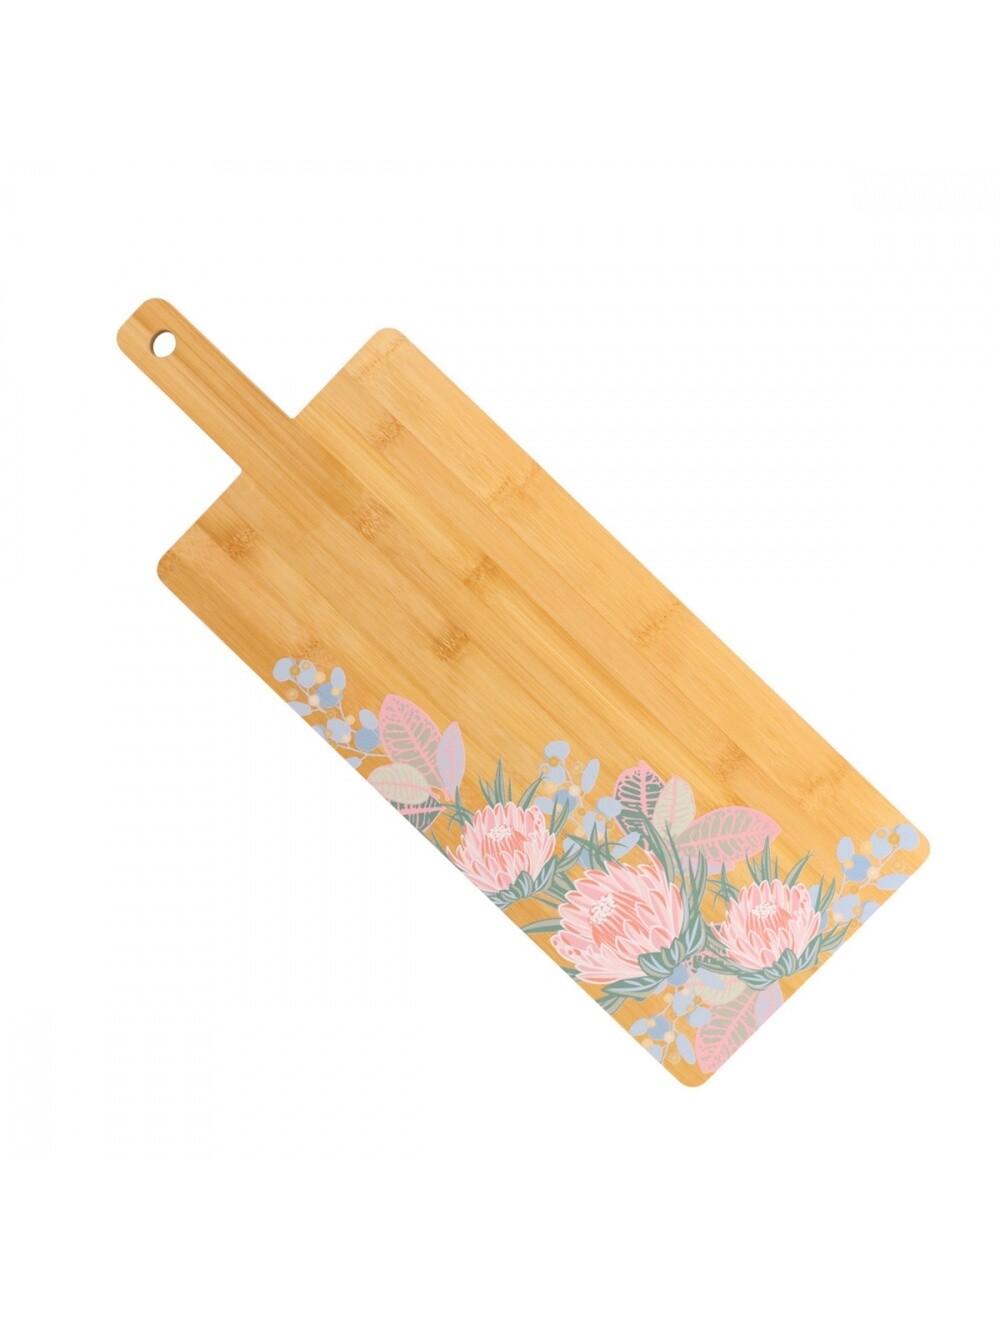 Botanica Rectangle Grazing Board